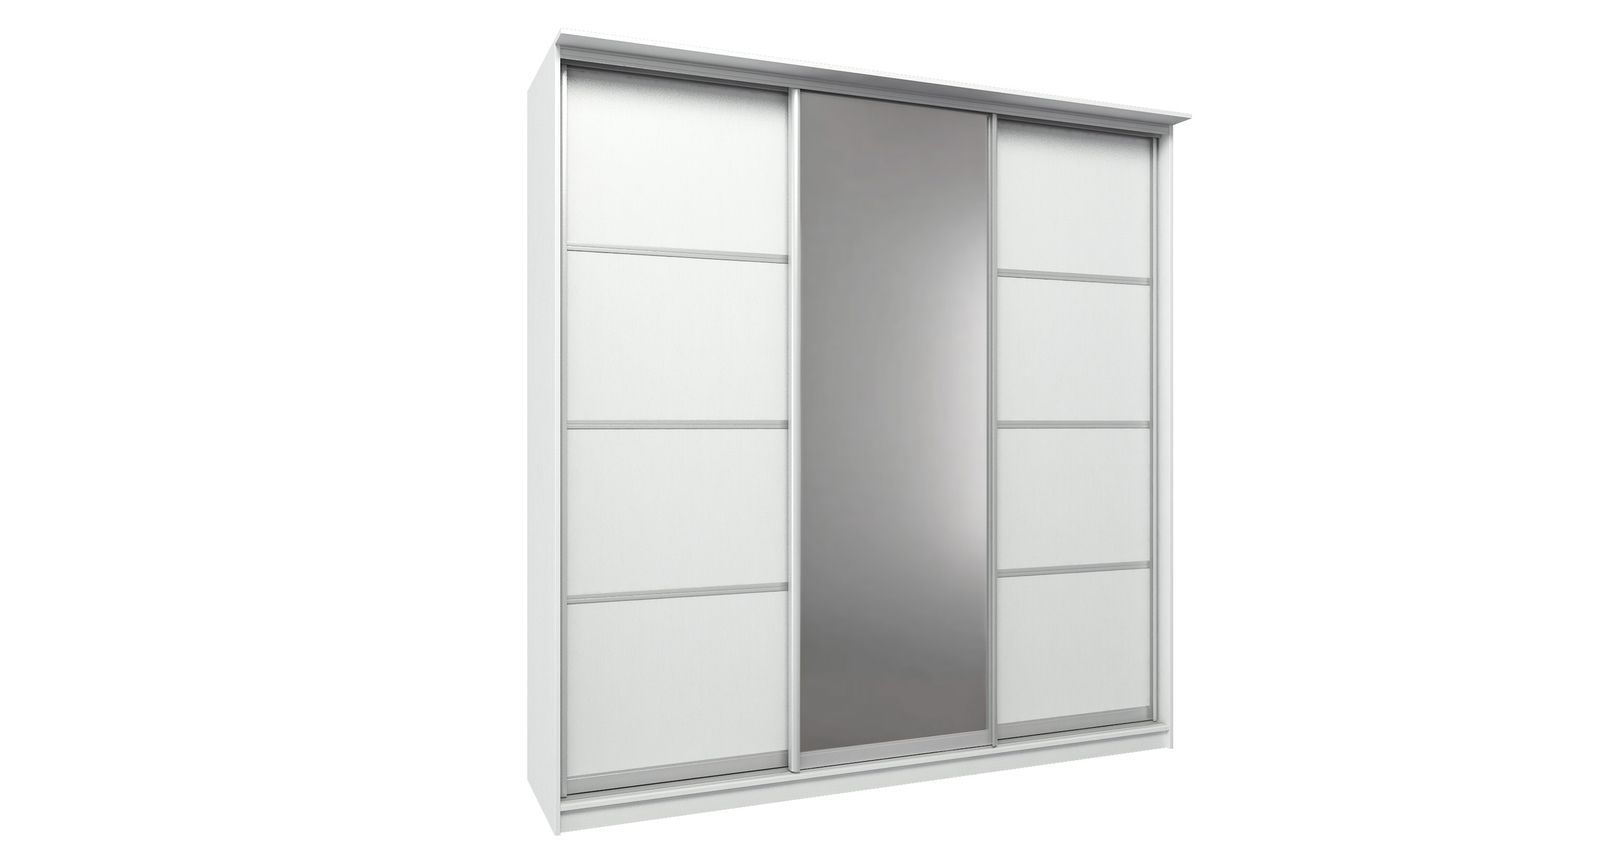 Шкаф-купе трехдверный Манчестер 234 см (белый+зеркало)